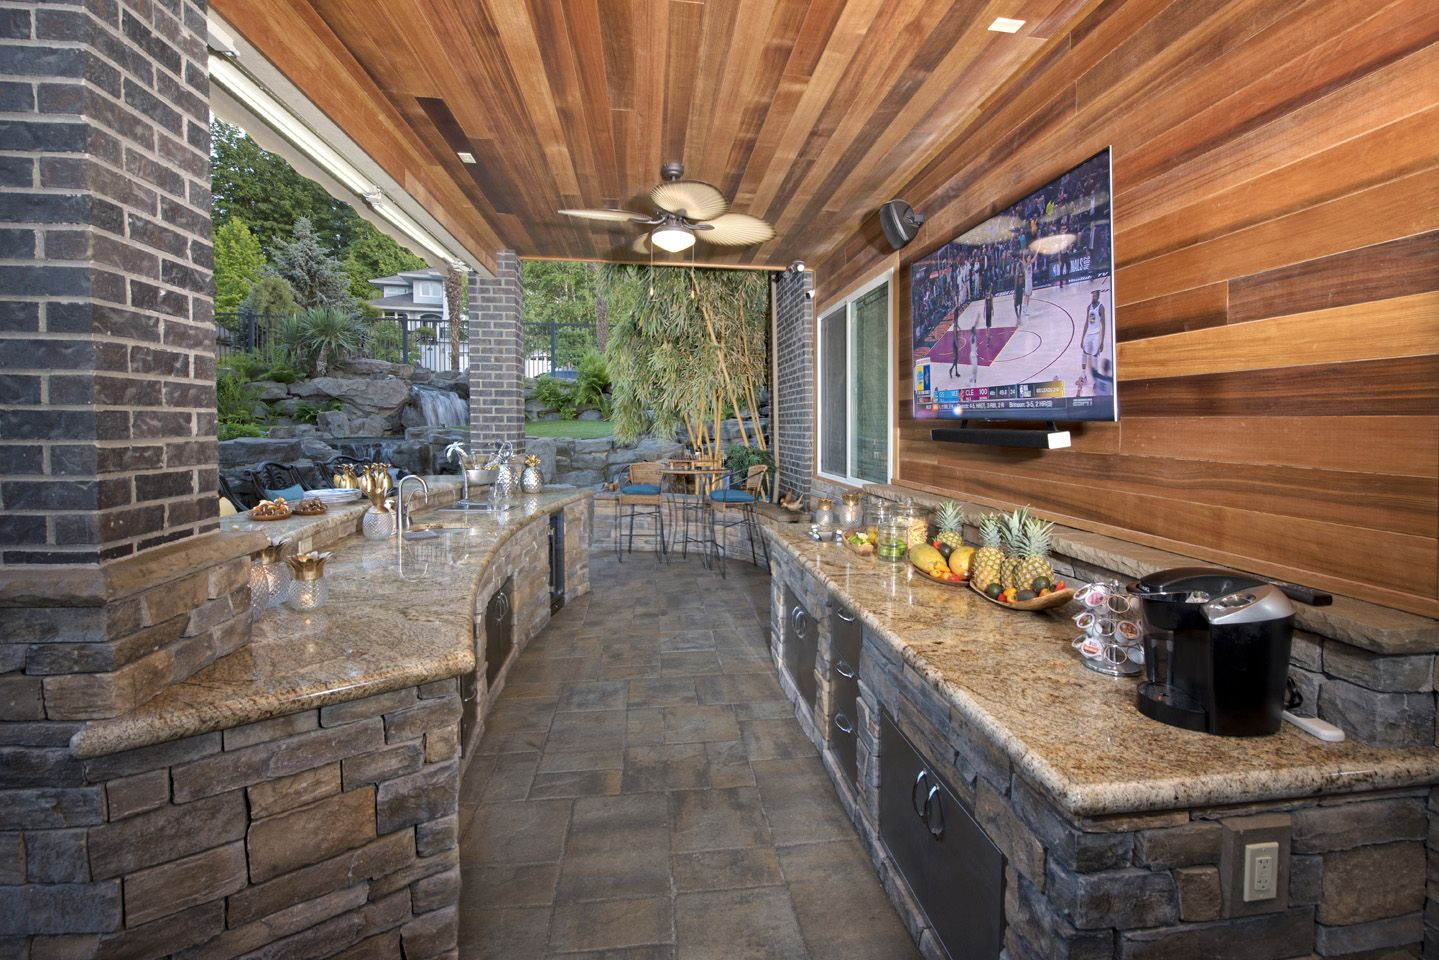 under deck waterproof outdoor living paradise restored landscaping backyard outdoor on outdoor kitchen on deck id=28787